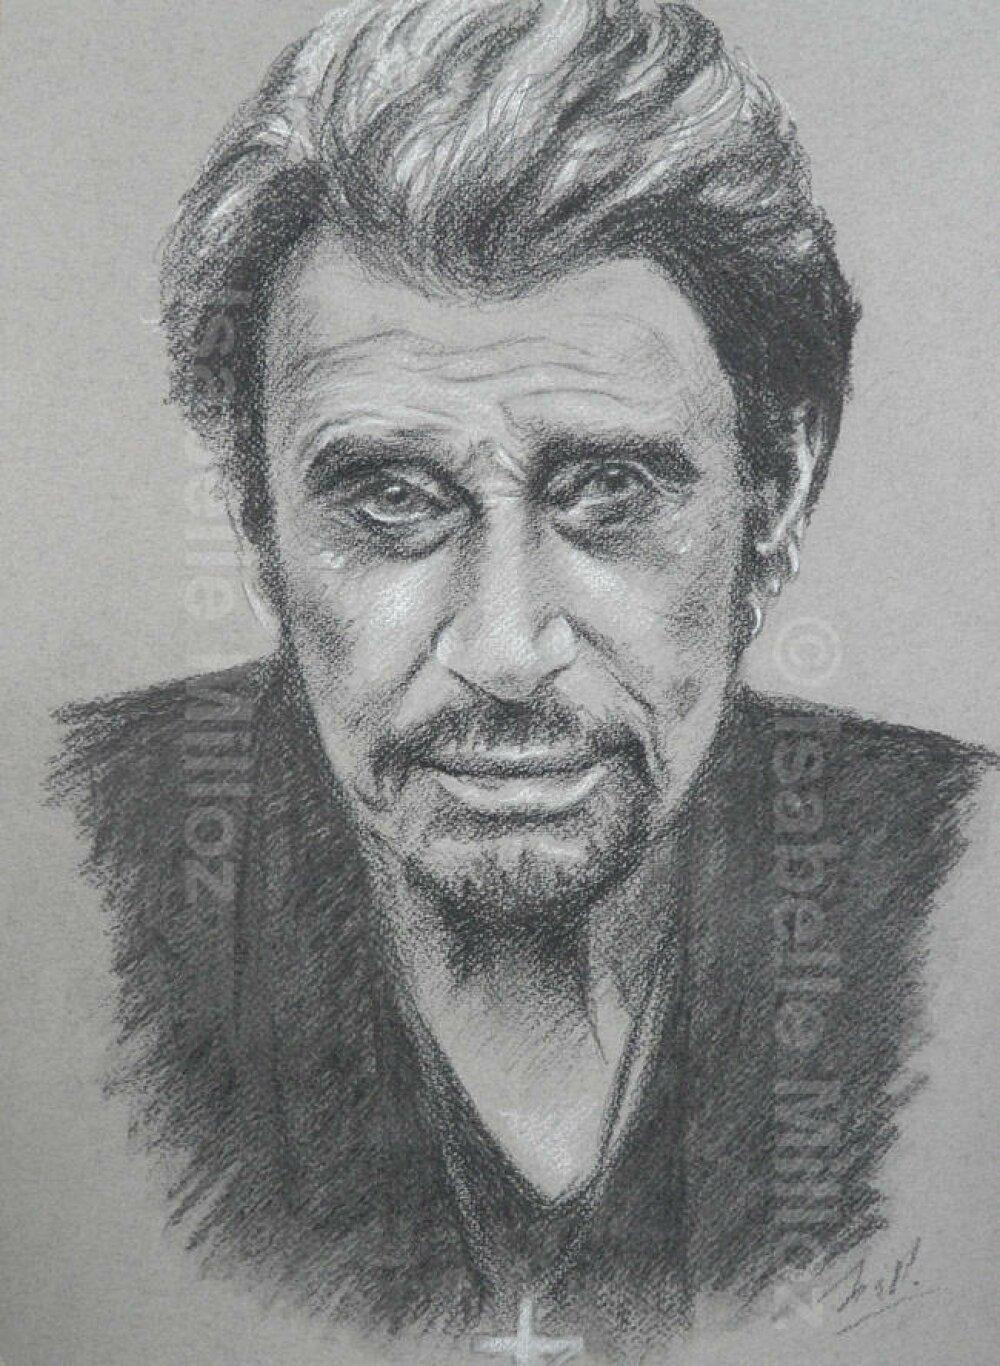 Johnny Hallyday Portrait Original 30x40 Cm Dessin A La Main